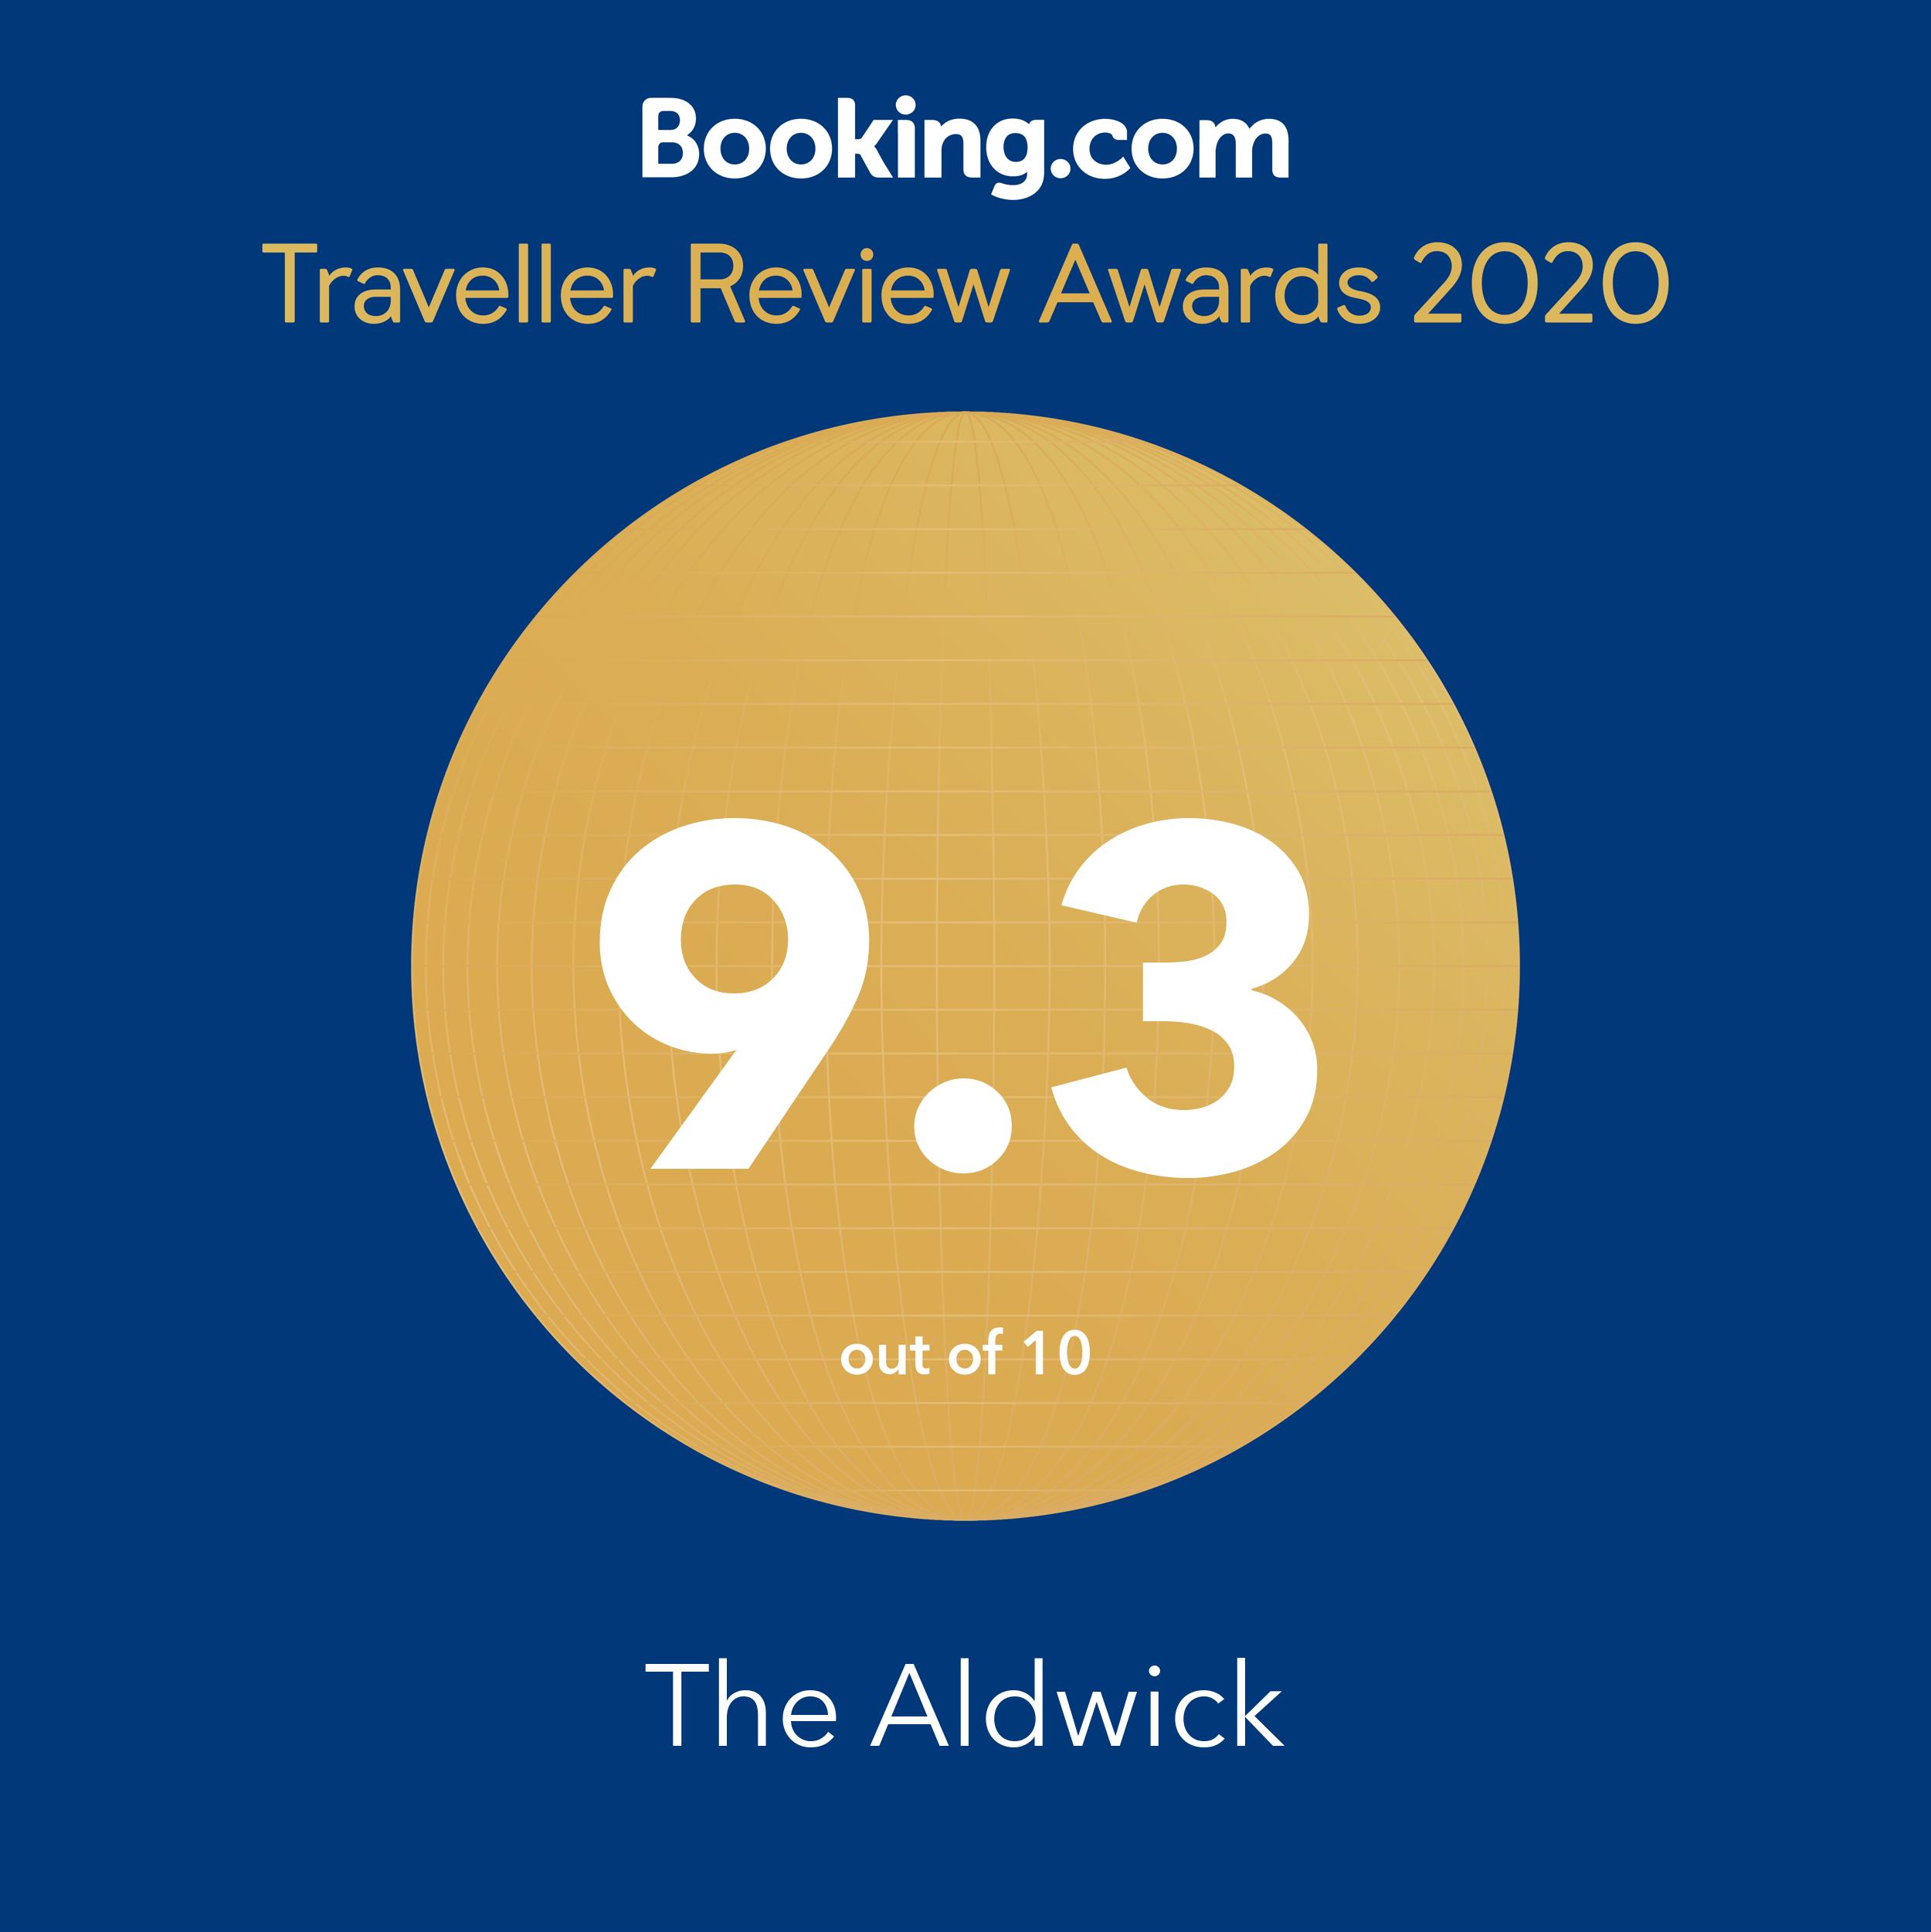 booking award 9.3